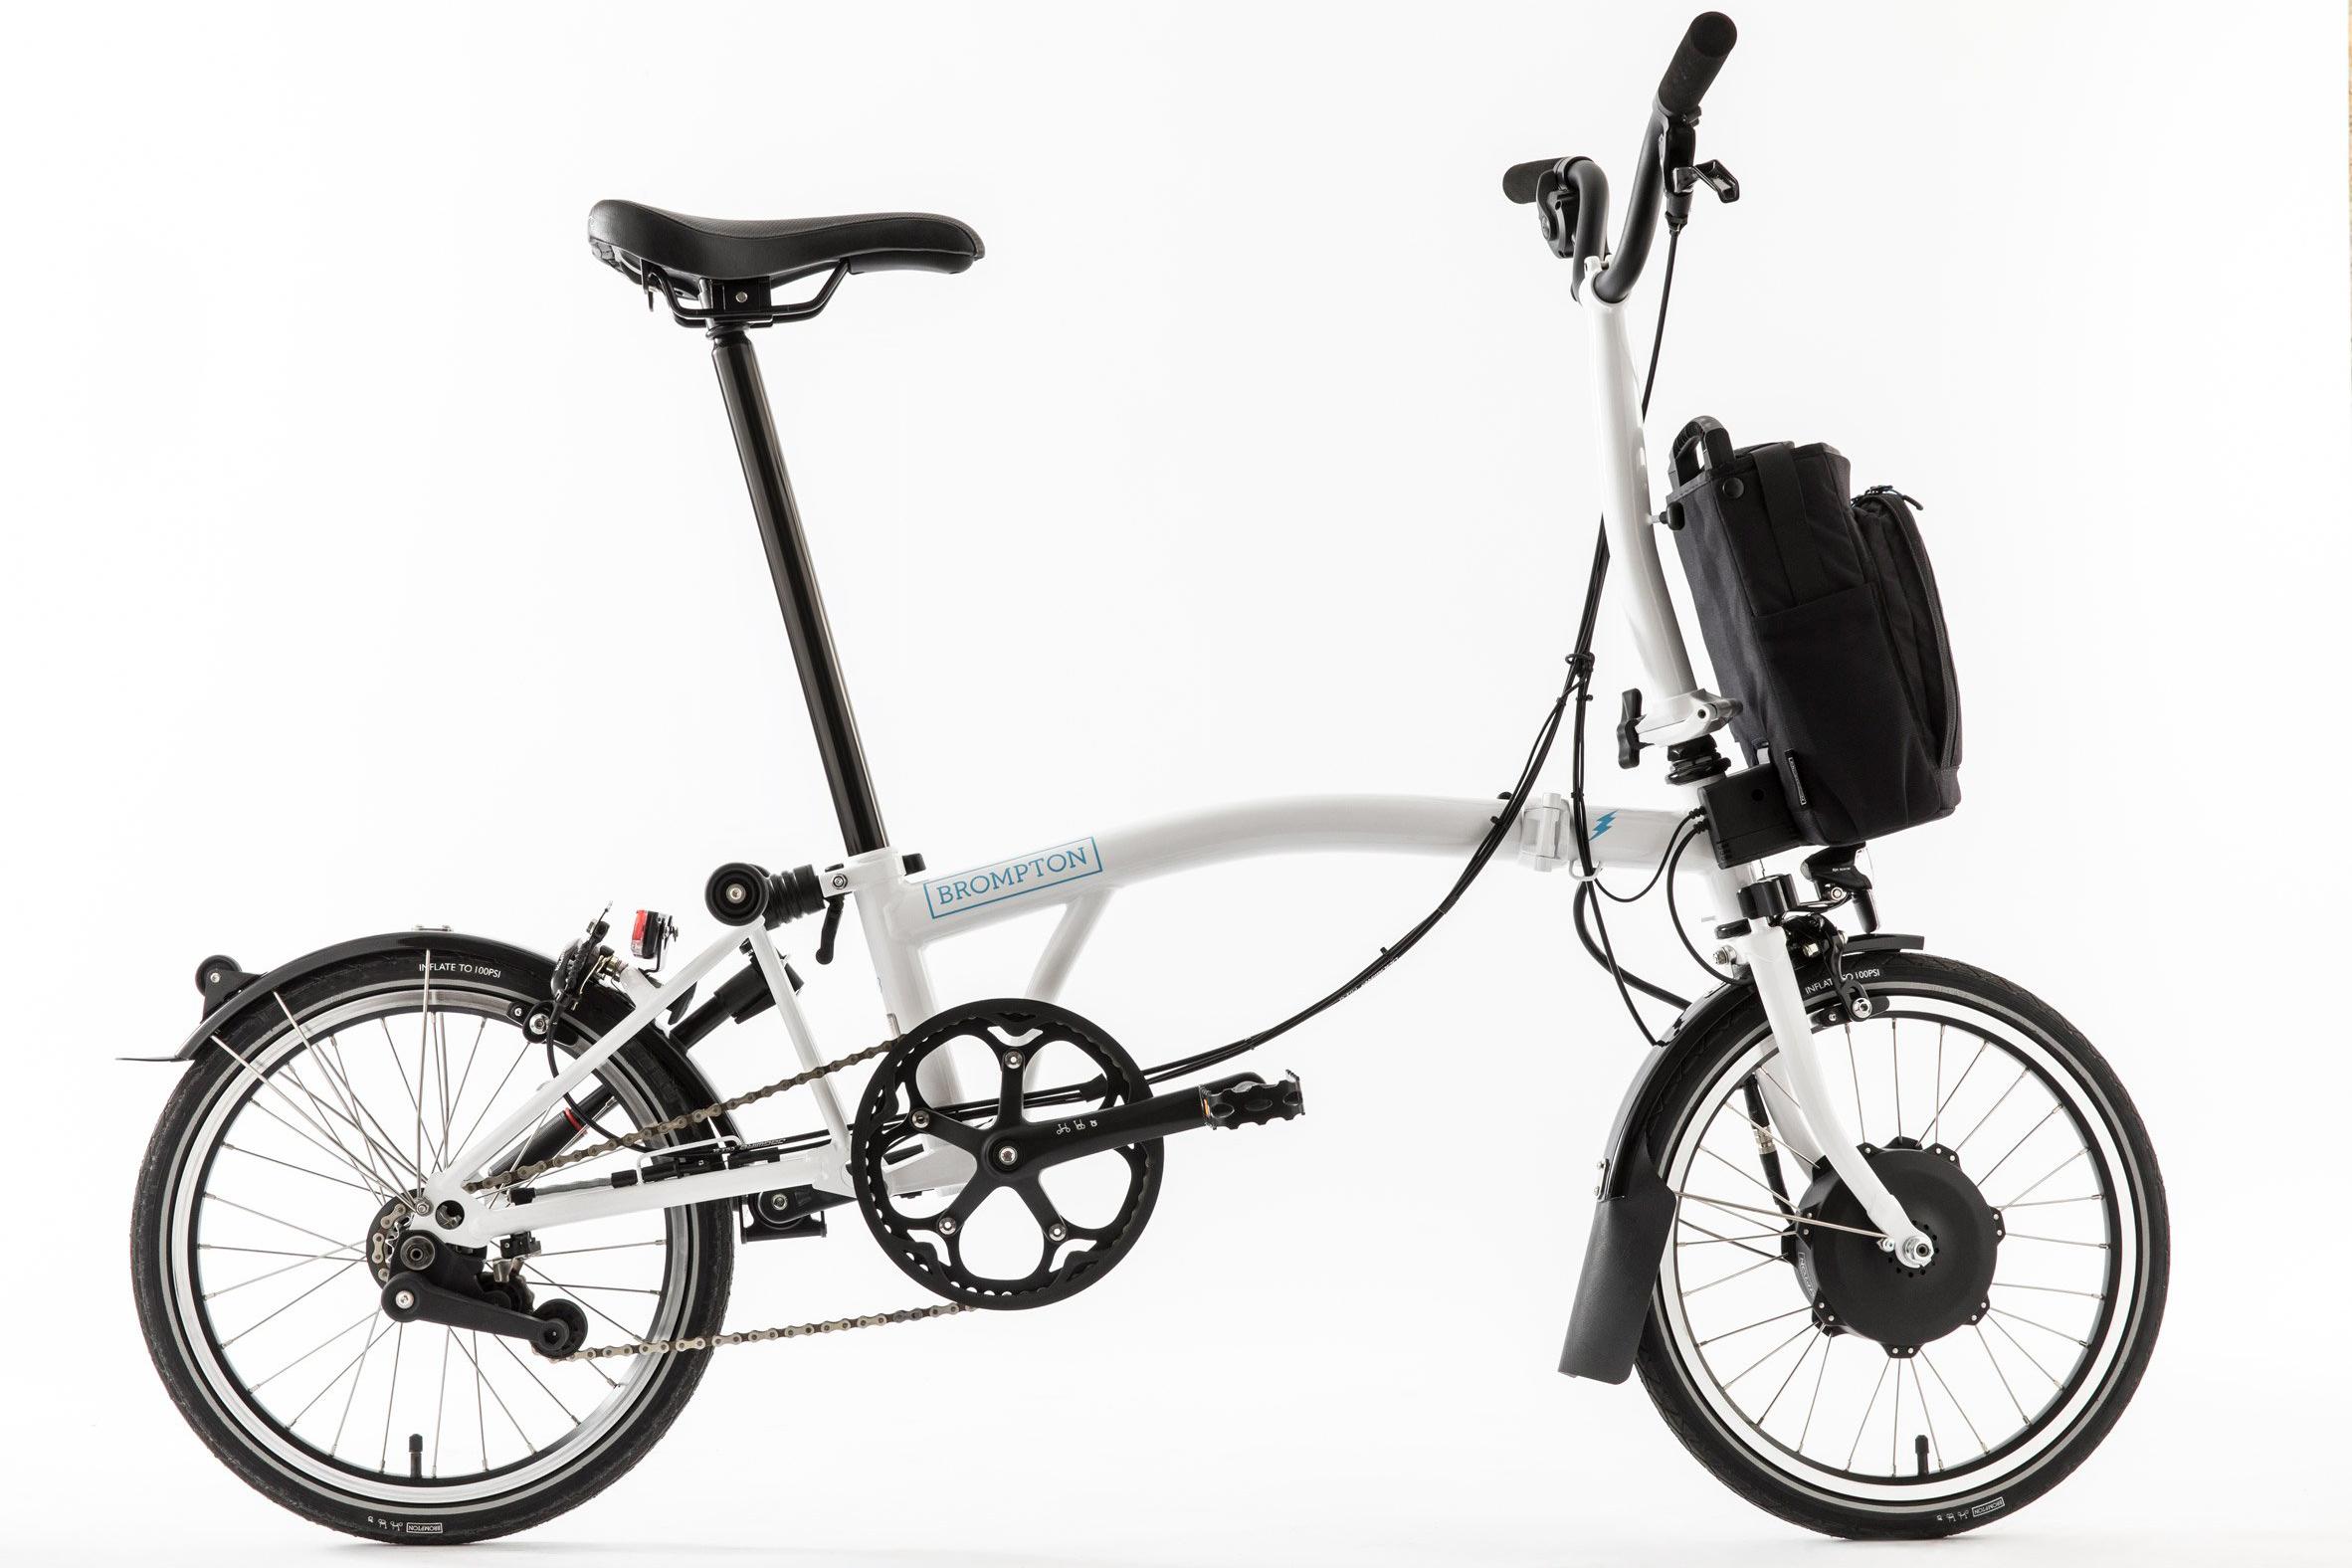 brompton-electric-bike-design-transport-_dezeen_2364_col_20.jpg